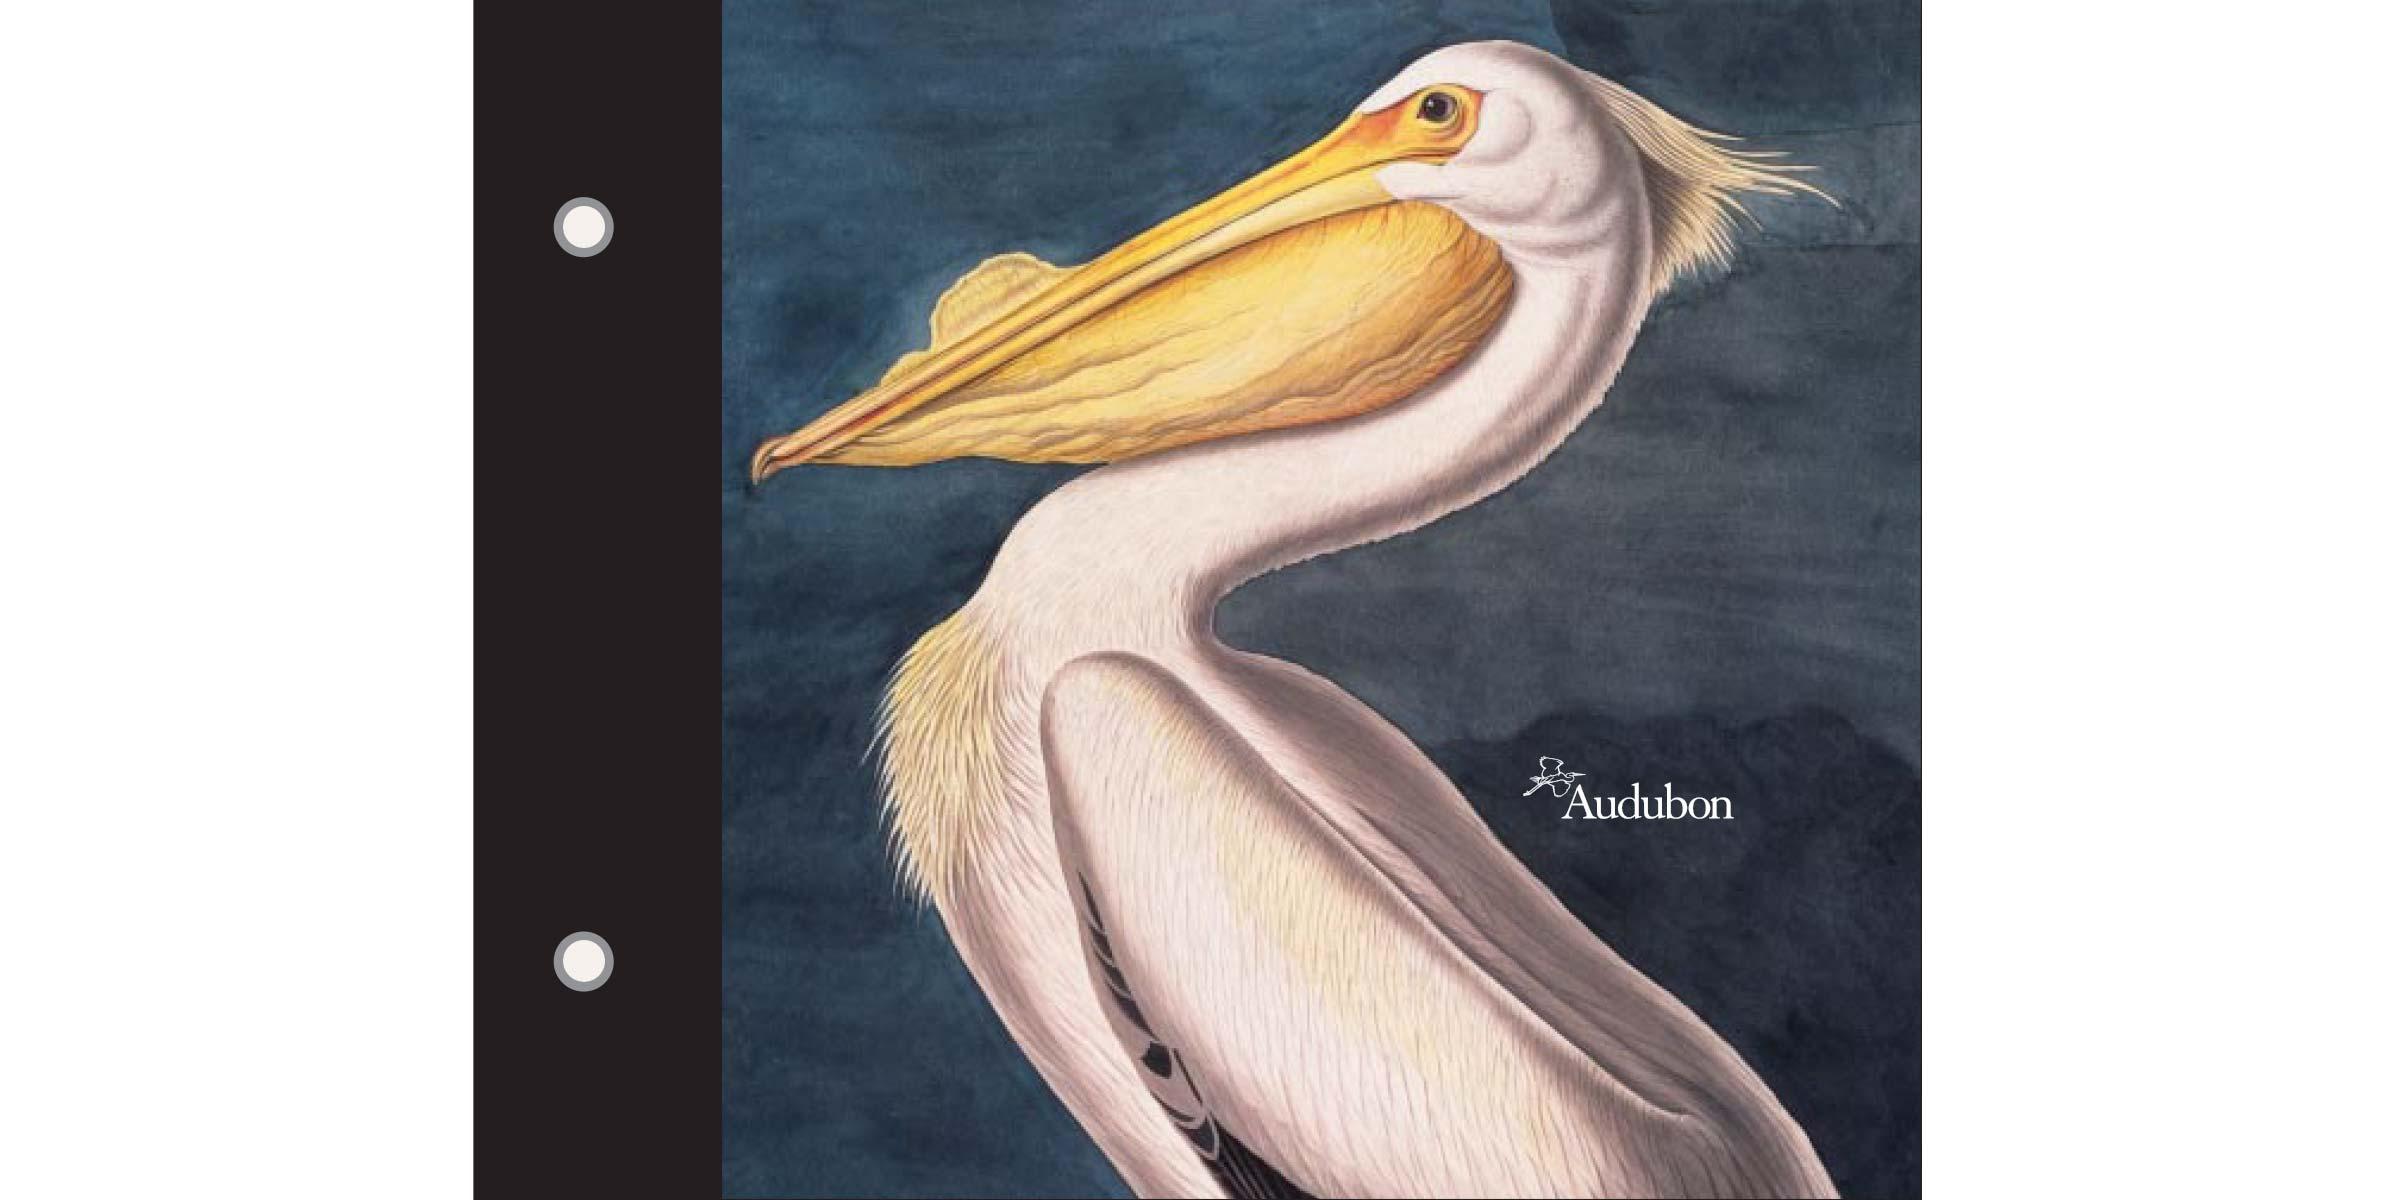 audubon_case-cover-wide.jpg